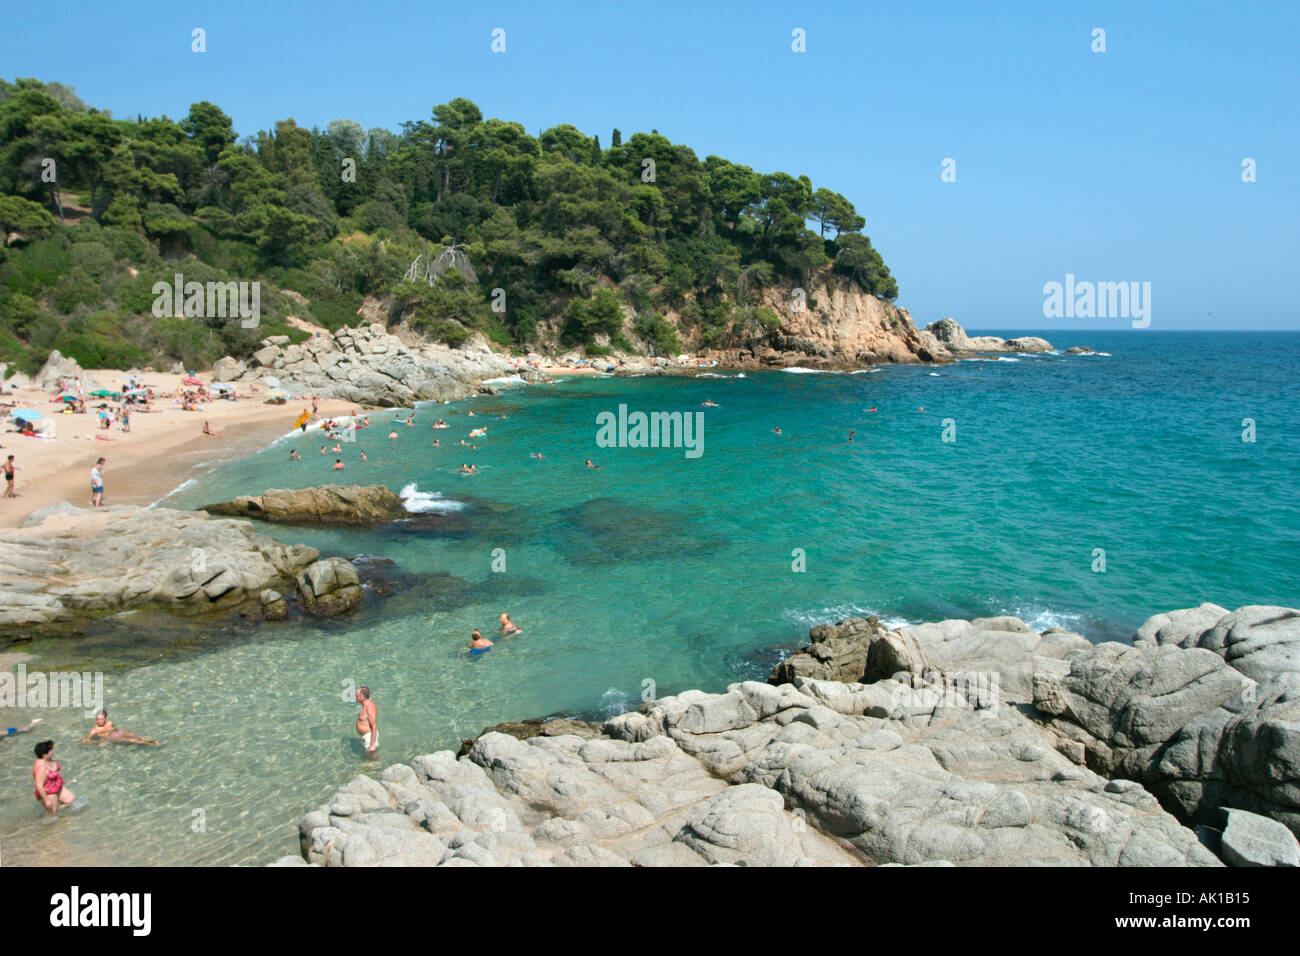 Small beach of Sa Boadella south west of Lloret de Mar, Costa Brava, Catalunya, Spain Stock Photo